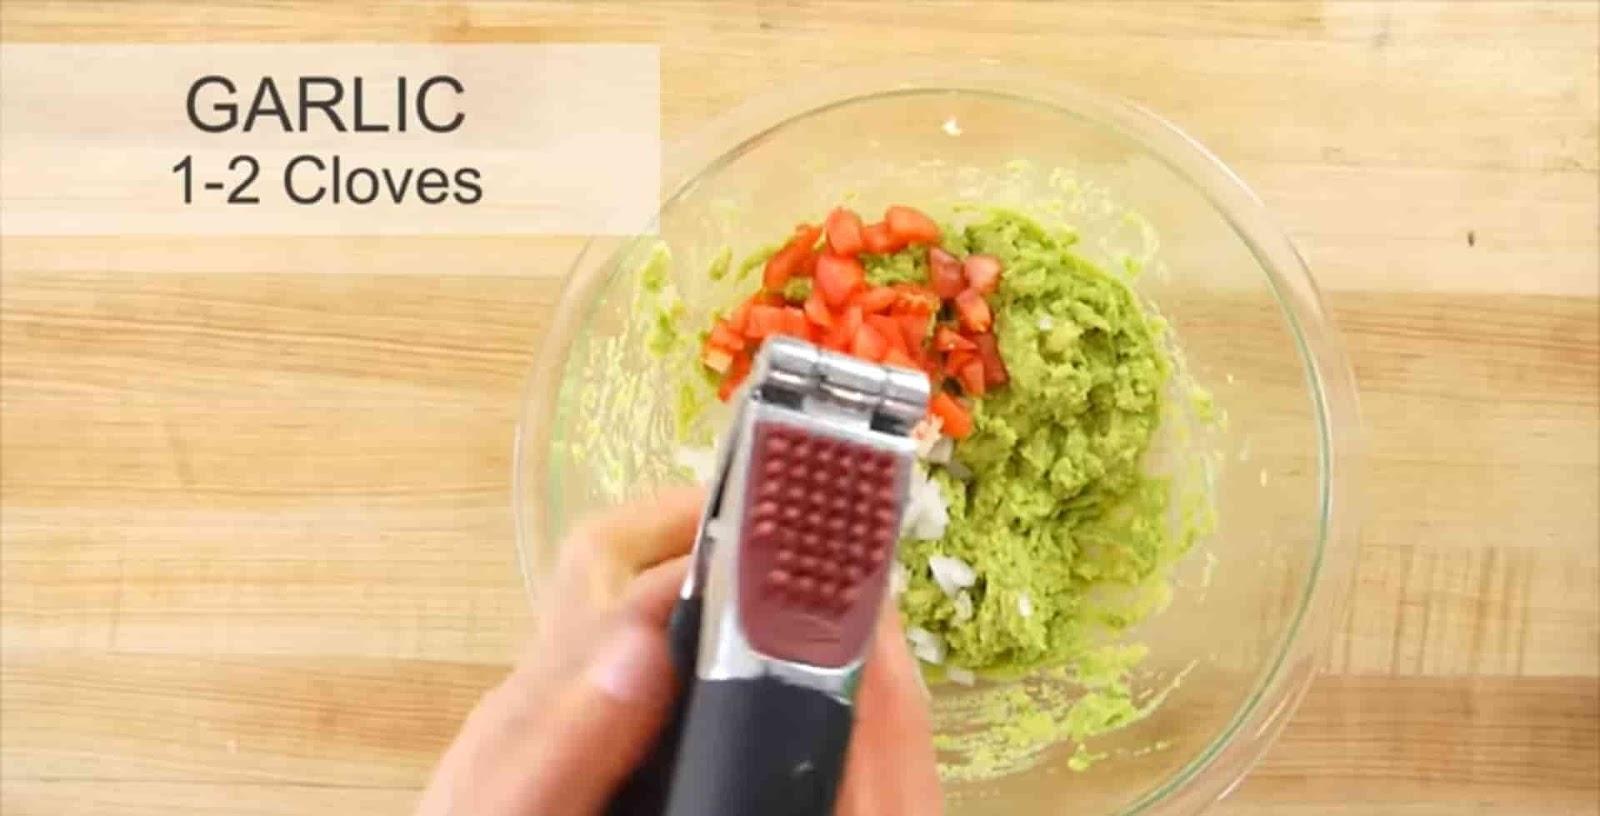 garlic-mashed-by-garlic-press-in-mashed-avocado